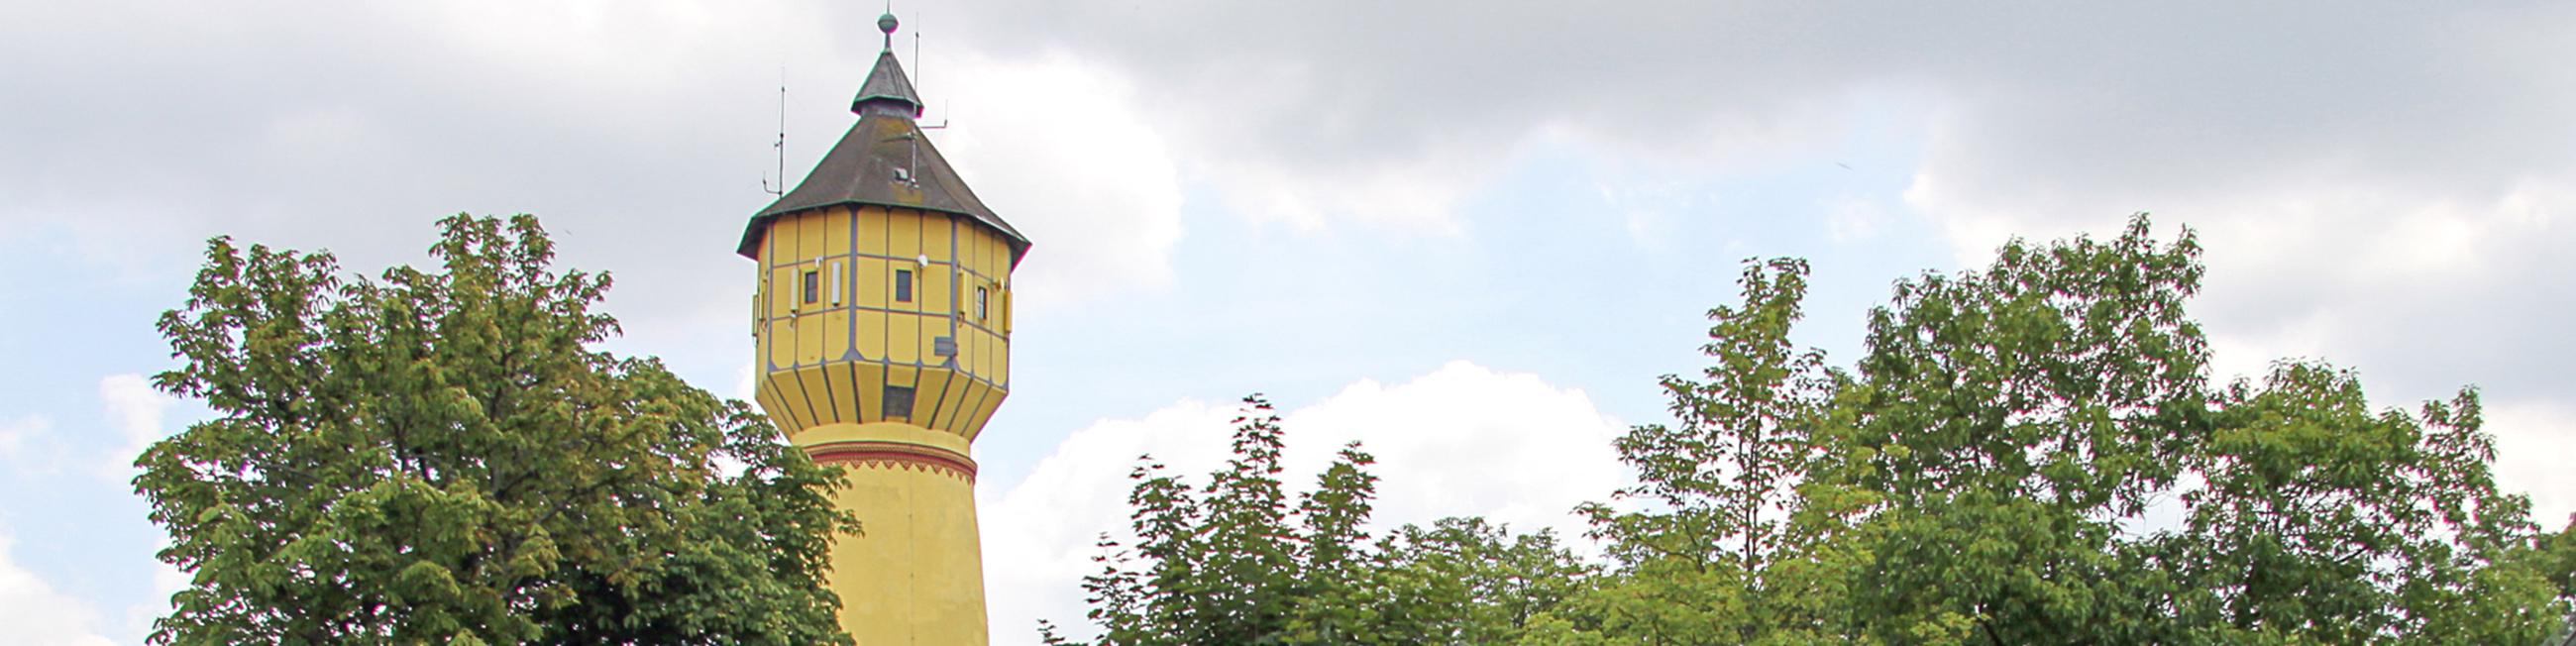 Wasserturm Kirchberg